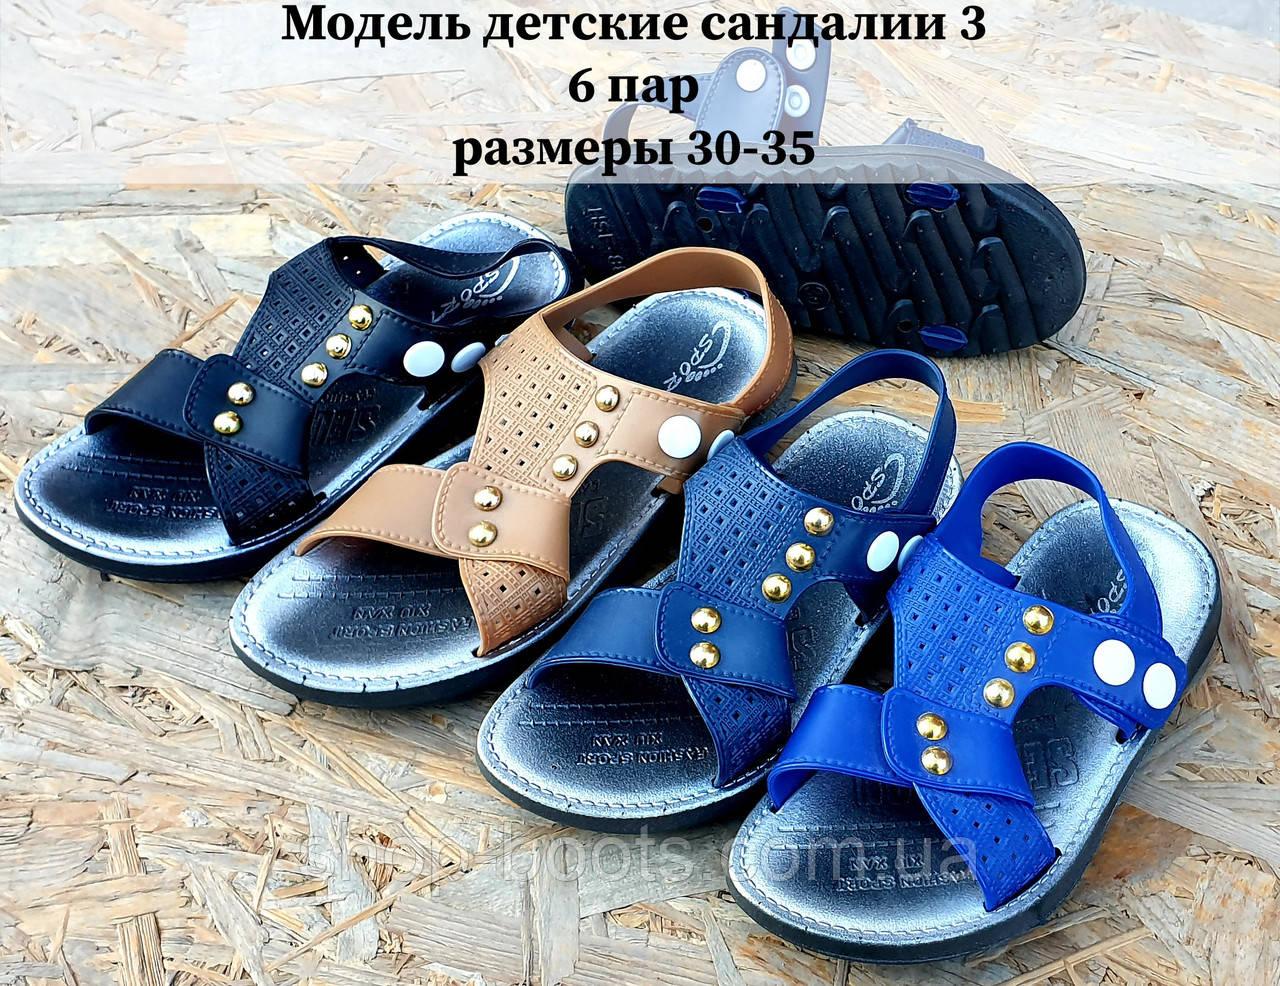 Детские сандалии оптом. 30-35рр. Модель детские сандалии 3